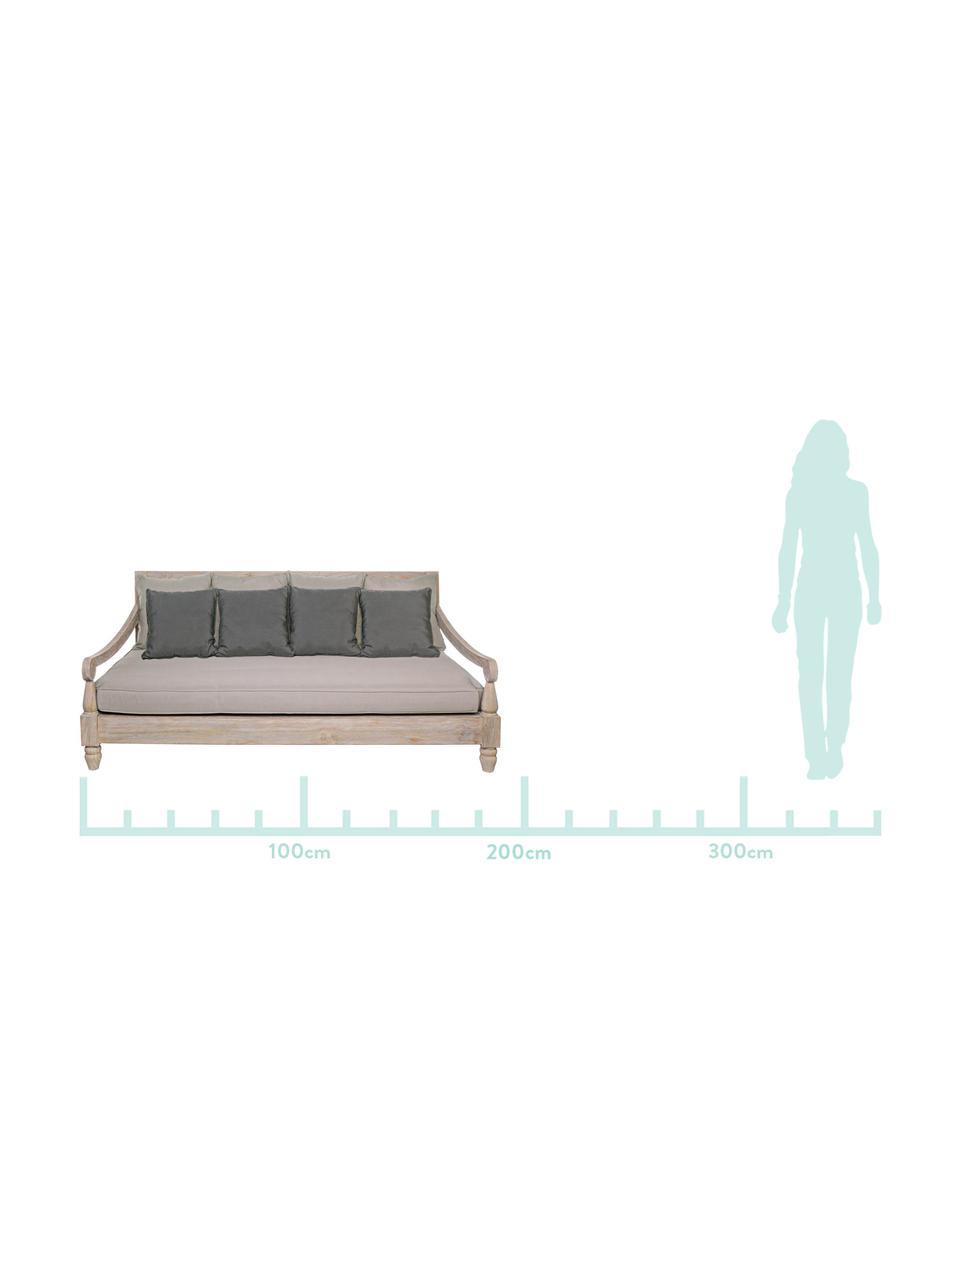 Outdoor loungebank Bali van teakhout (3-zits), Frame: teakhout, Bekleding: 100% polyester, UV- en wa, Frame: teakhoutkleurig. Bekleding: grijs, 190 x 112 cm